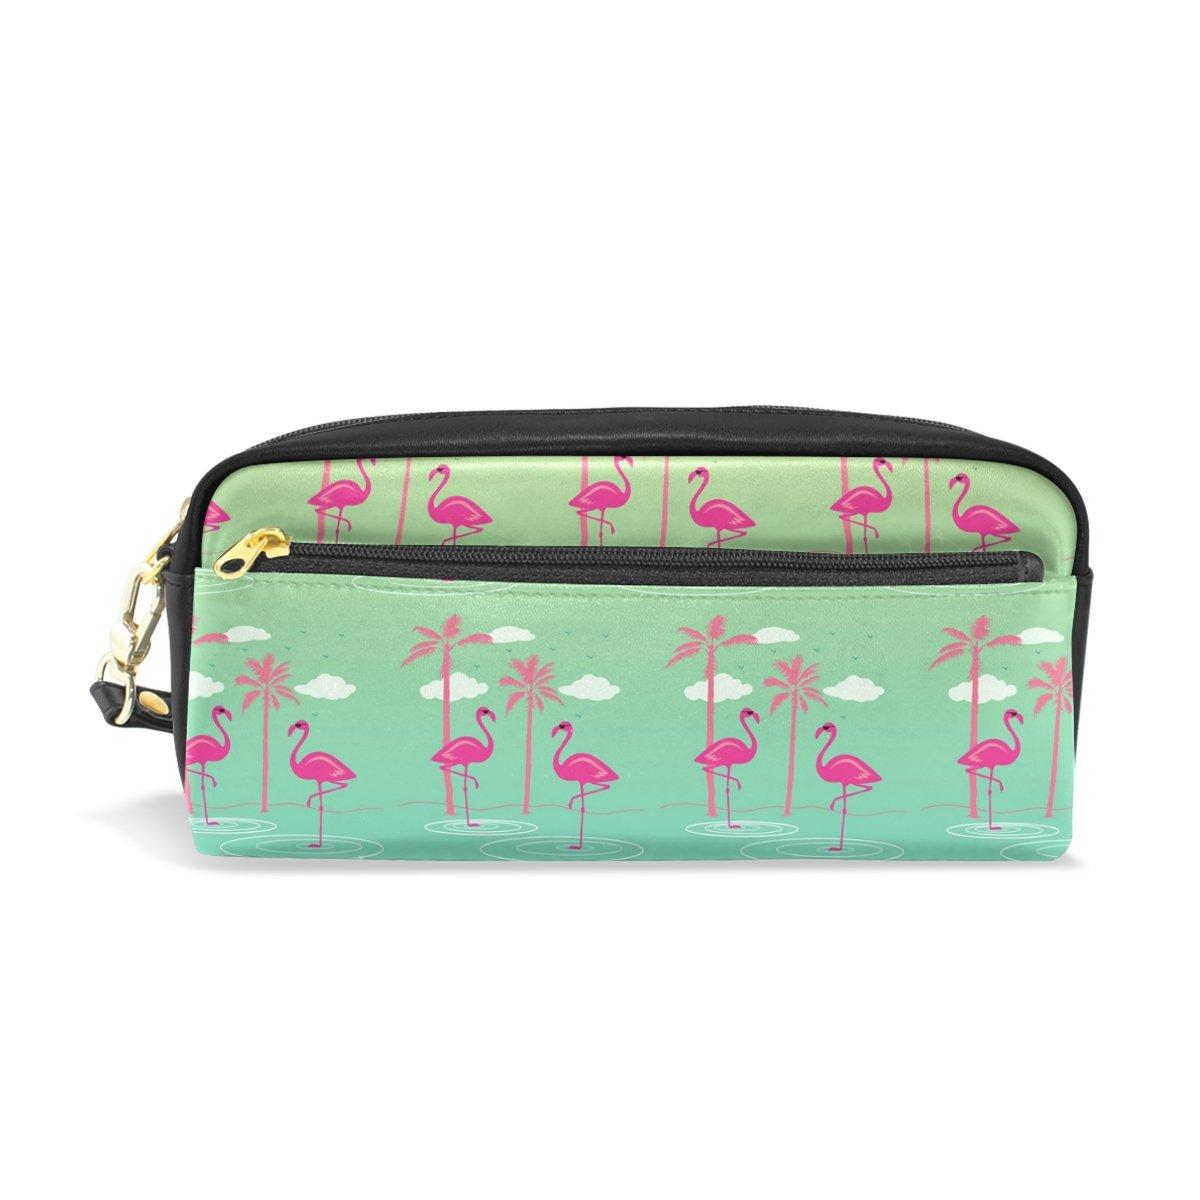 BENNIGIRY Flamingo Bleistift Fall tragbar Pen Tasche Student Schreibwaren Pouch PU Leder Groß Kapazität Reißverschluss Make-up Kosmetiktasche B078NH96LG     | Qualitätsprodukte